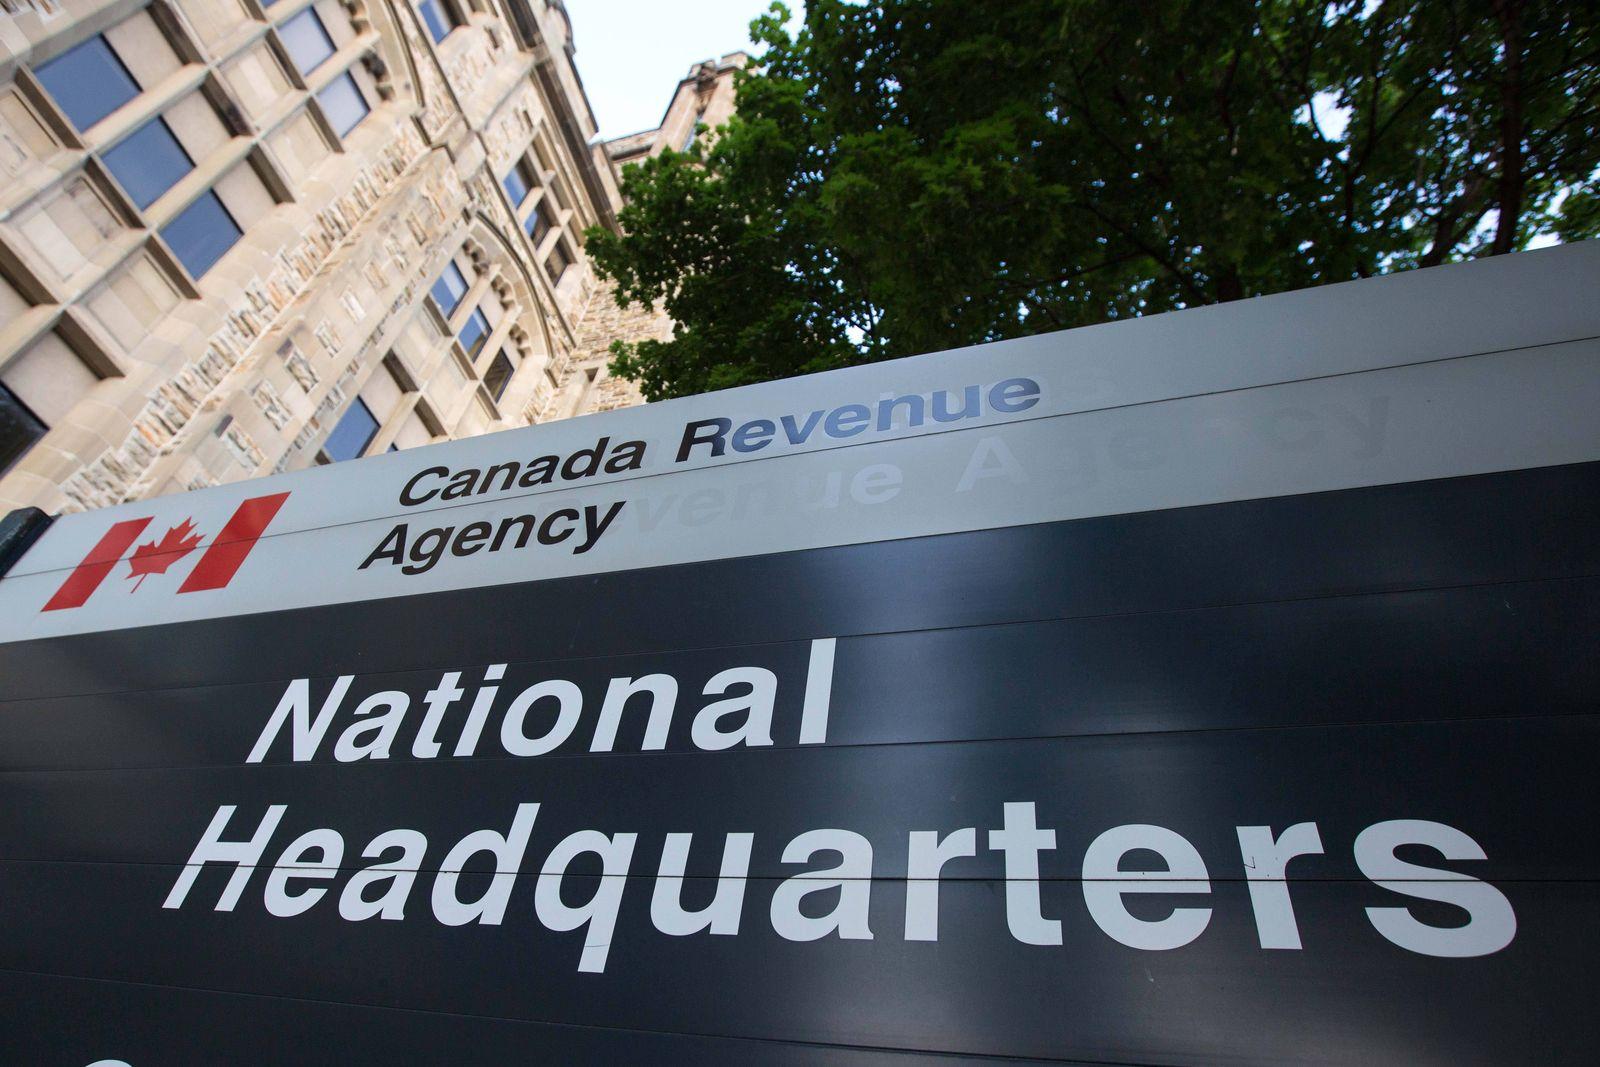 July 4 2016 Ottawa Ontario Canada Canada Revenue Agency s national headquarters in Ottawa On